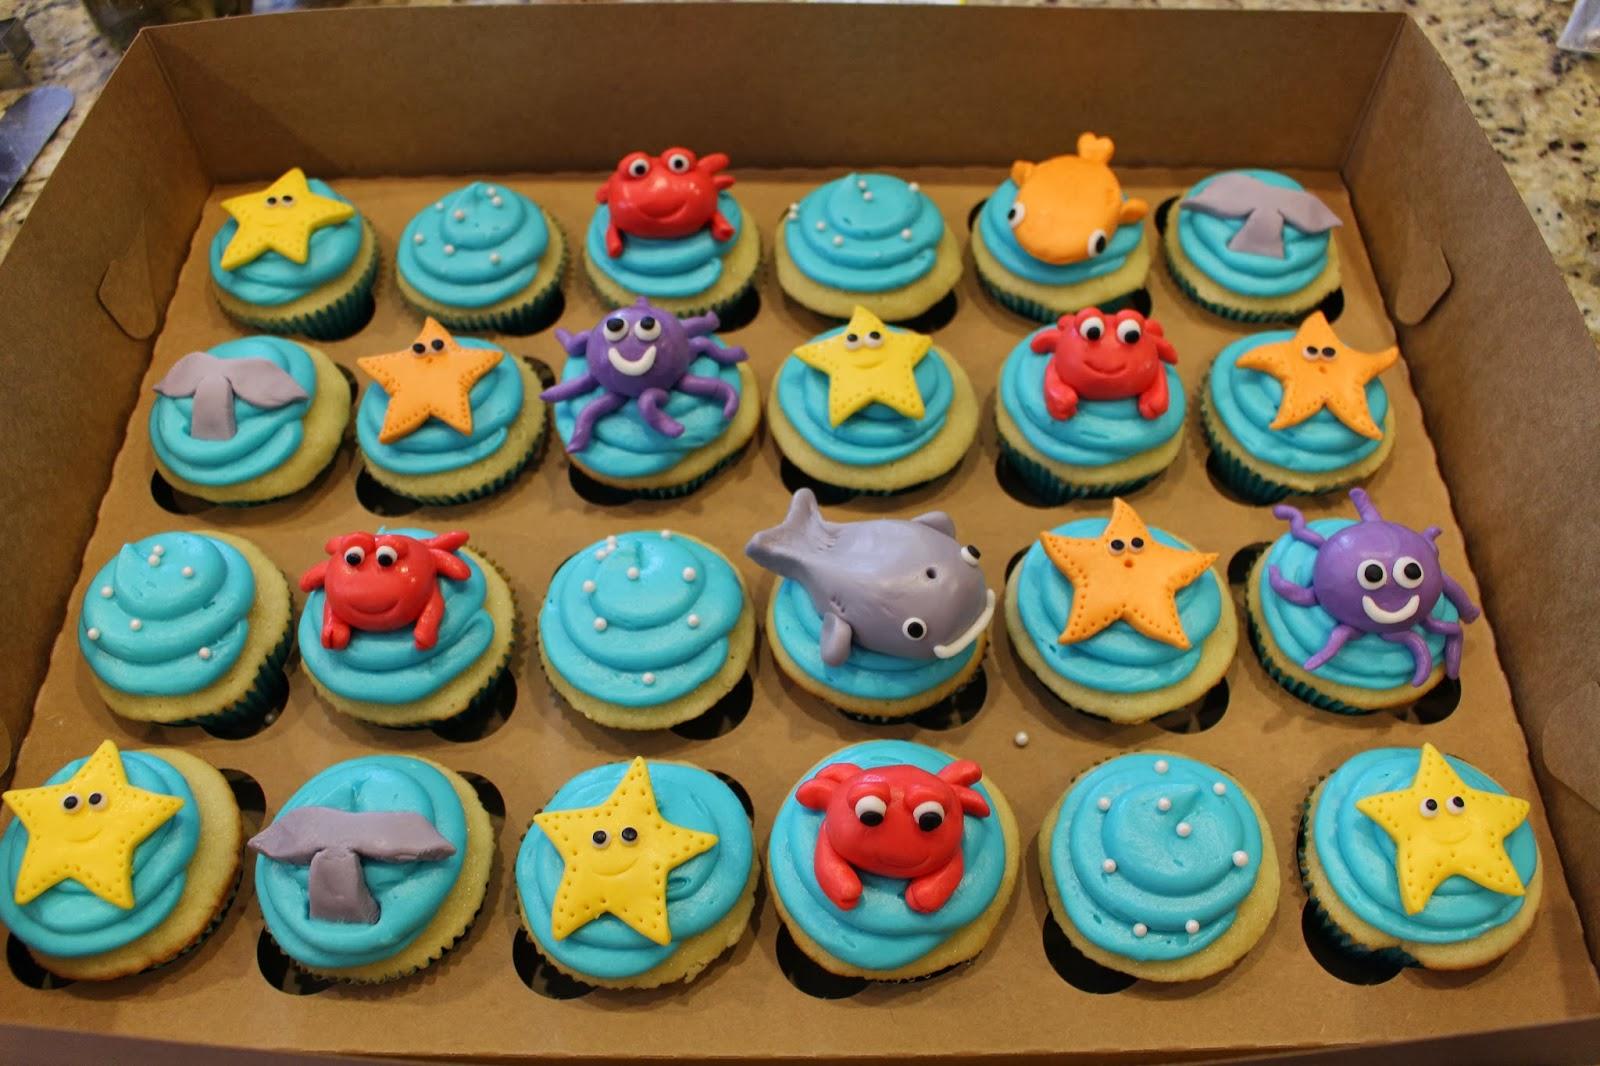 Cupiddycakes Quot Under The Sea Quot Cupcakes For A Friend S